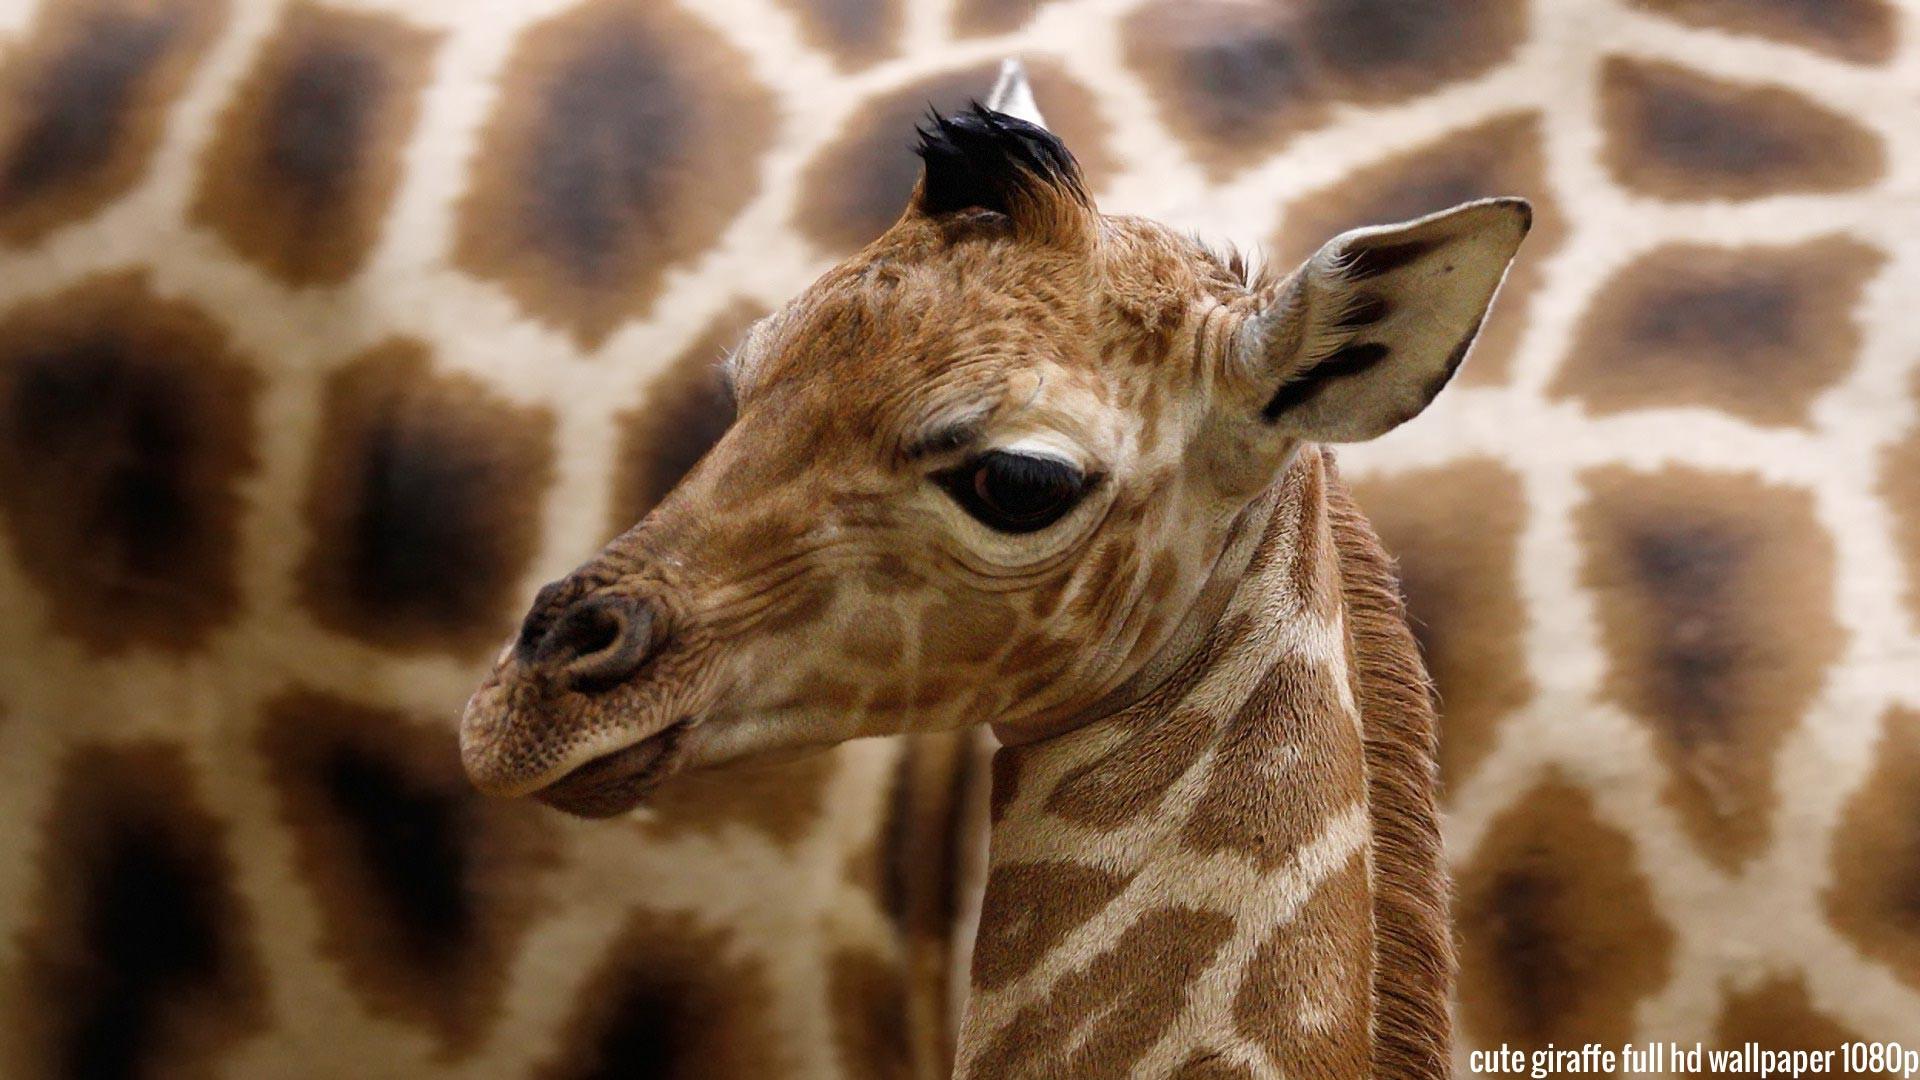 Baby Giraffe Wallpaper hd Cute Giraffe Full hd Wallpaper